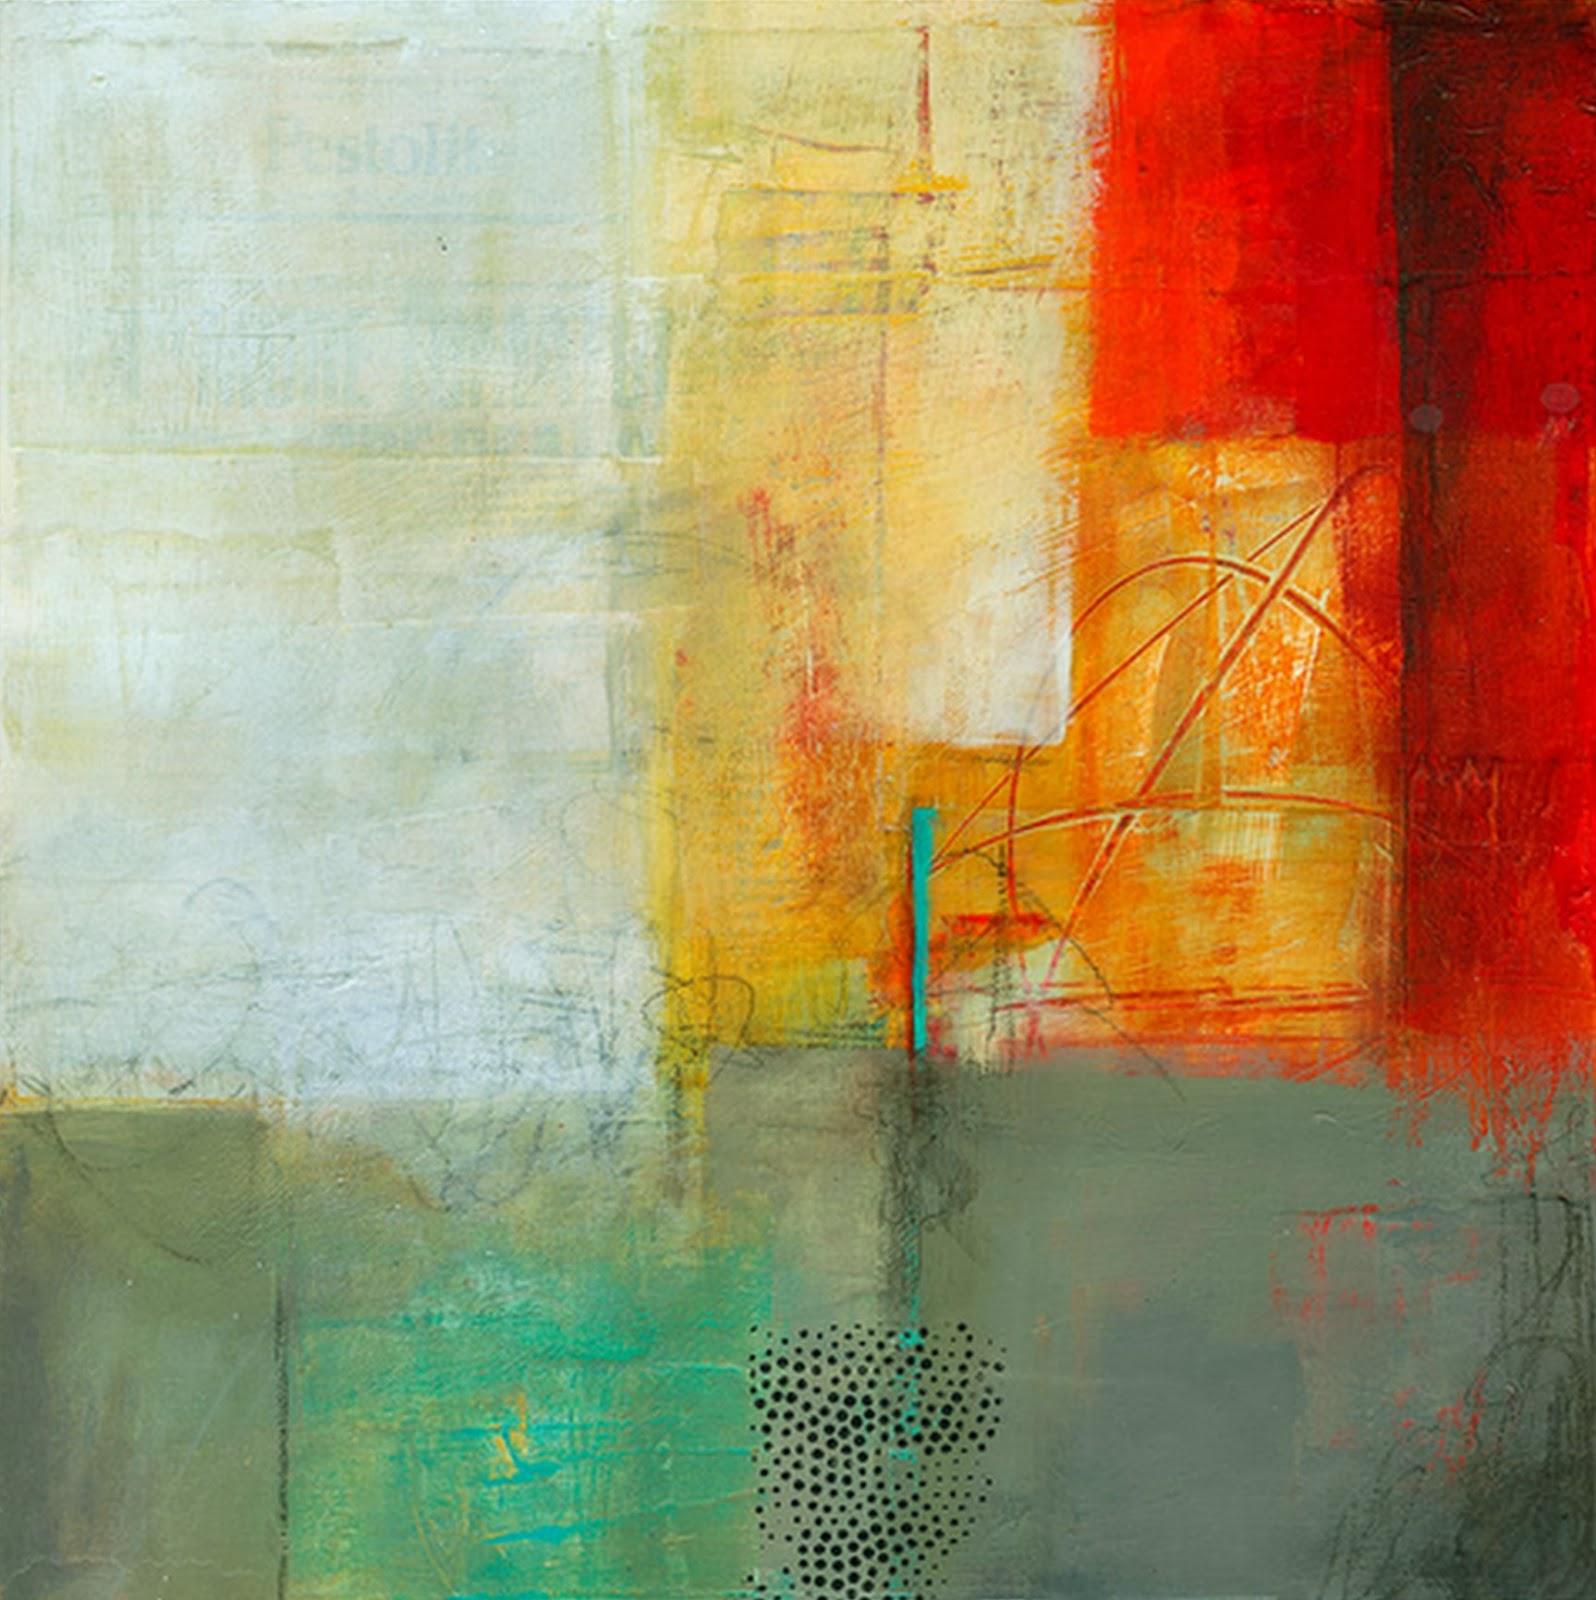 Galeria Pinturas De Arte: Cuadros Modernos Pinturas Y Dibujos : Abstractos Modernos